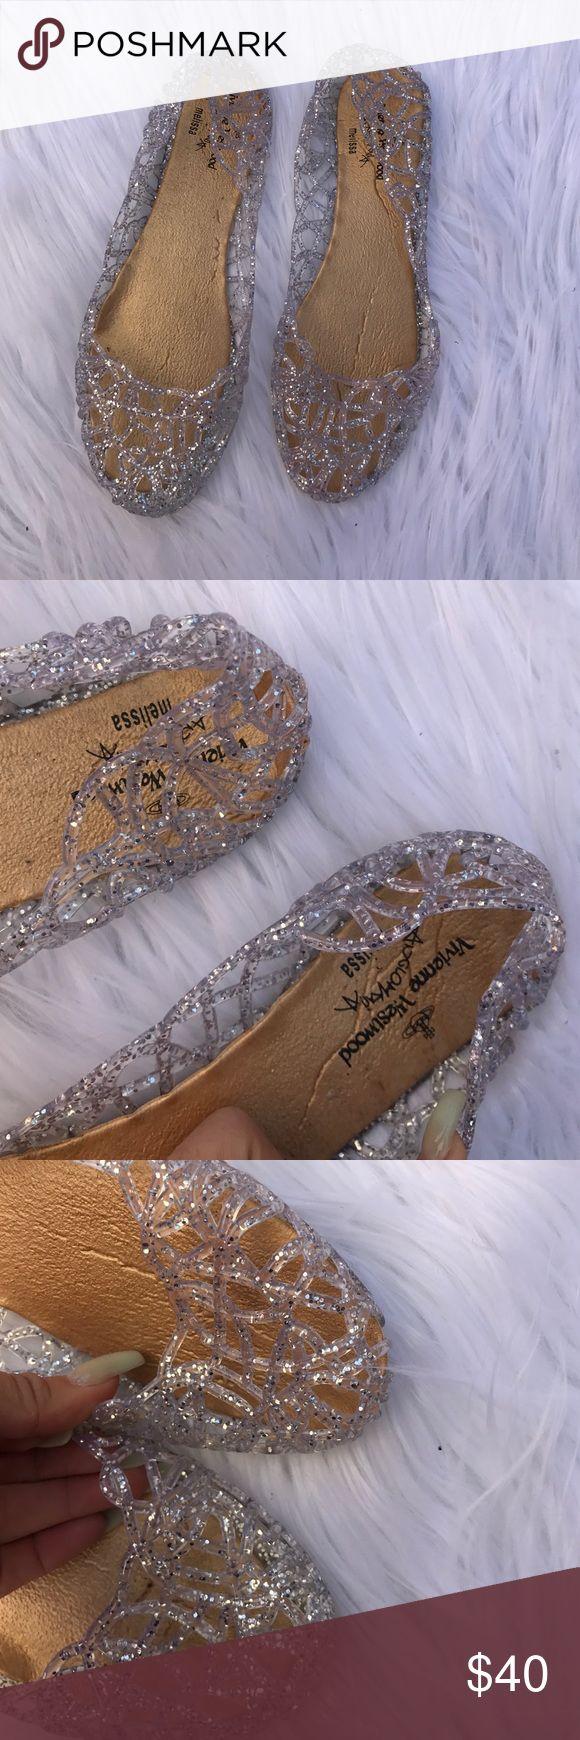 VIVIENNE WESTWOOD SZ 7 JELLY FLATS SHOES GLITTER ANGLOMANIA MELISSA VIVIENNE WESTWOOD FLATS Vivienne Westwood Shoes